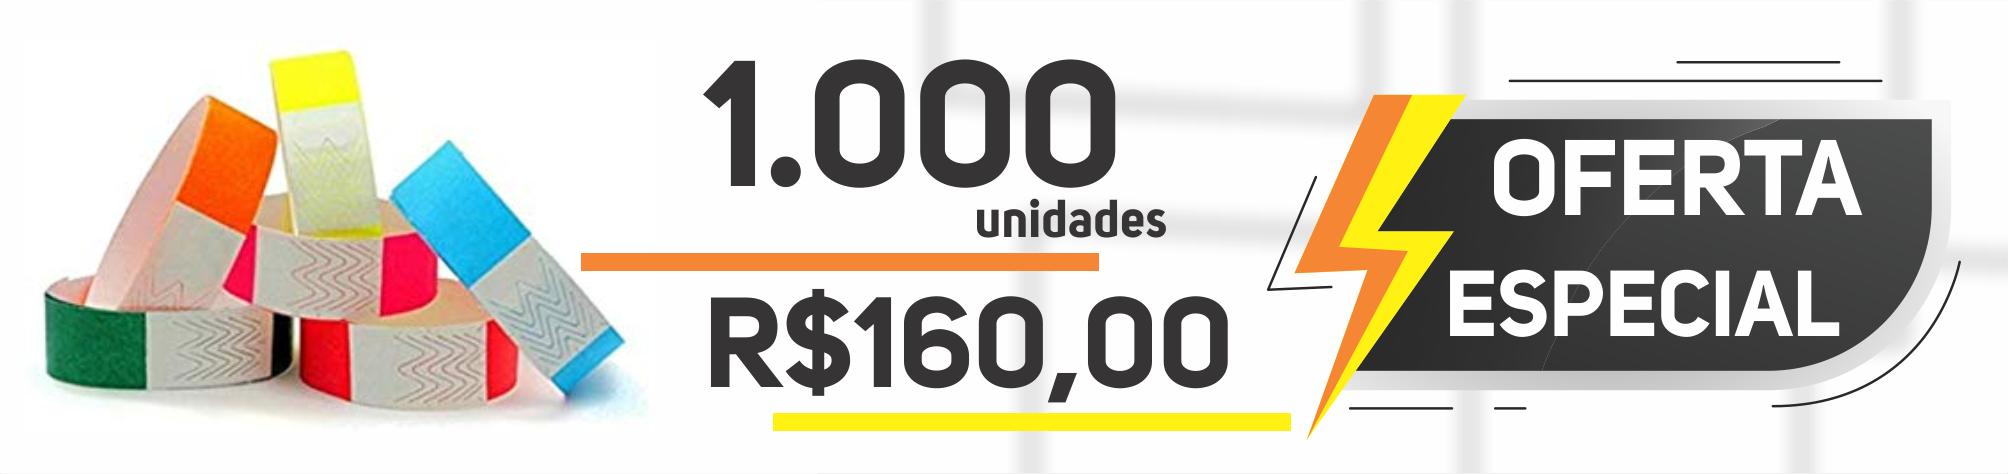 Oferta 1000